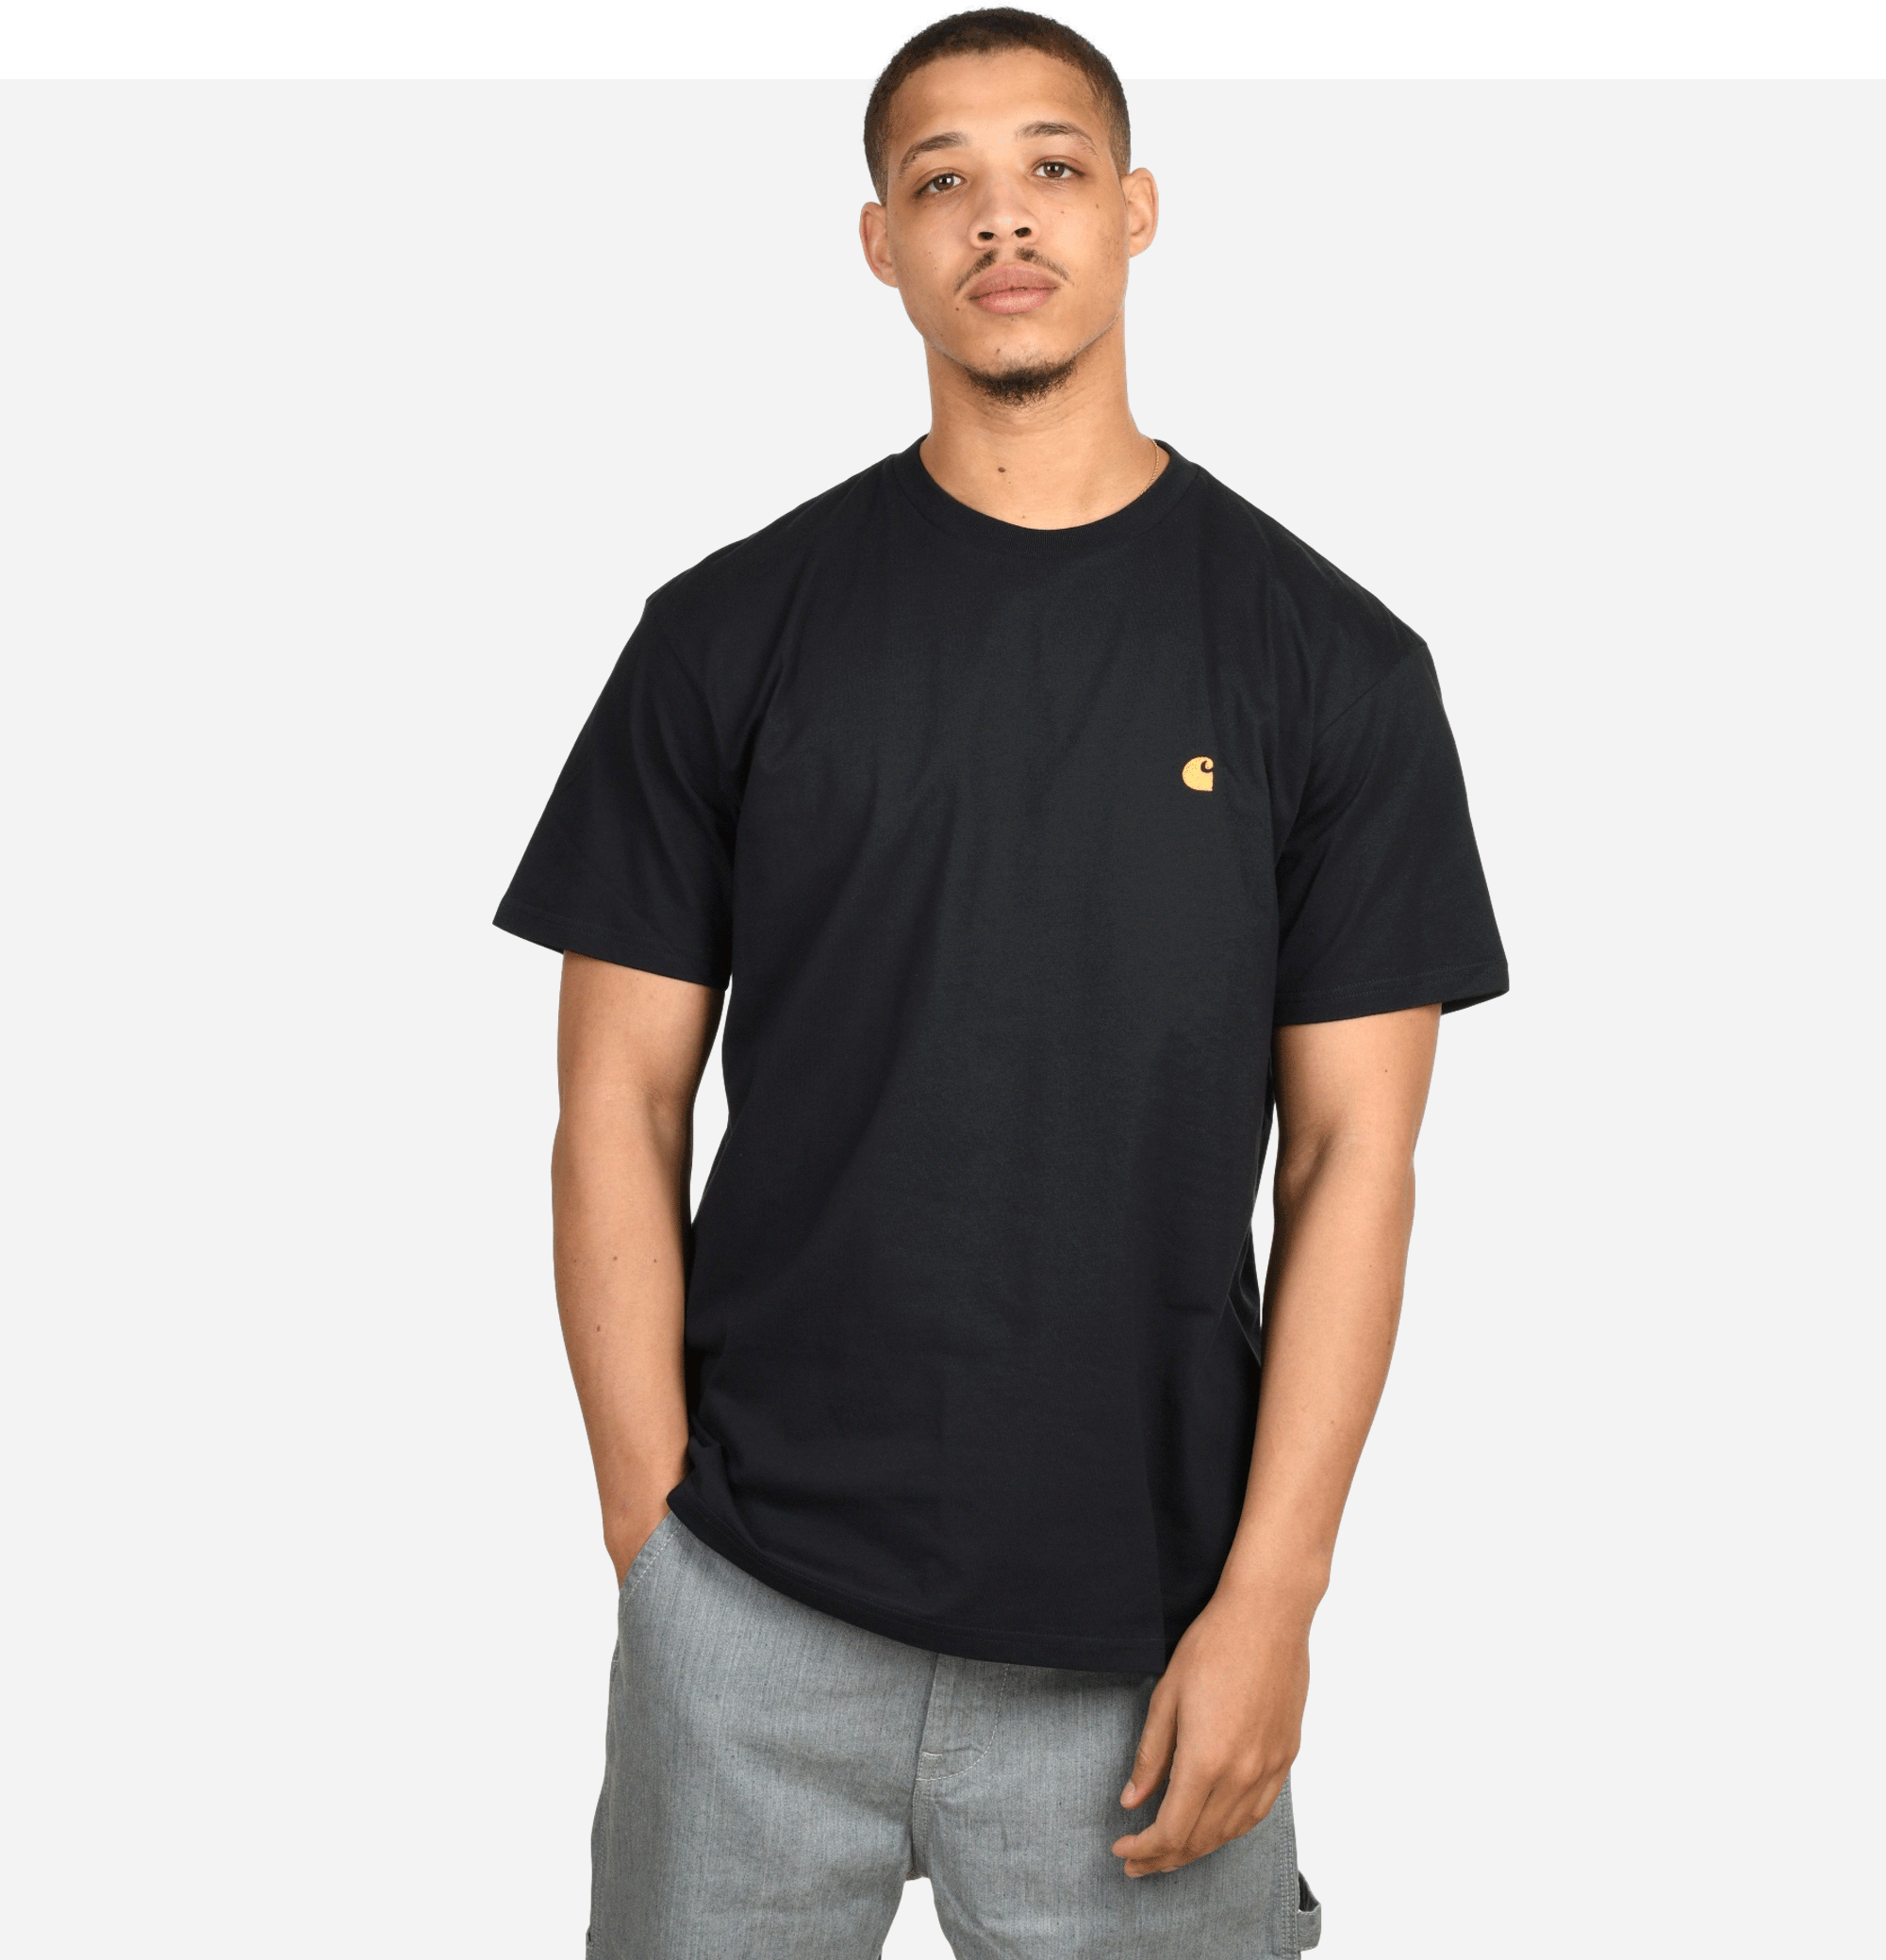 Chase T-shirt Navy